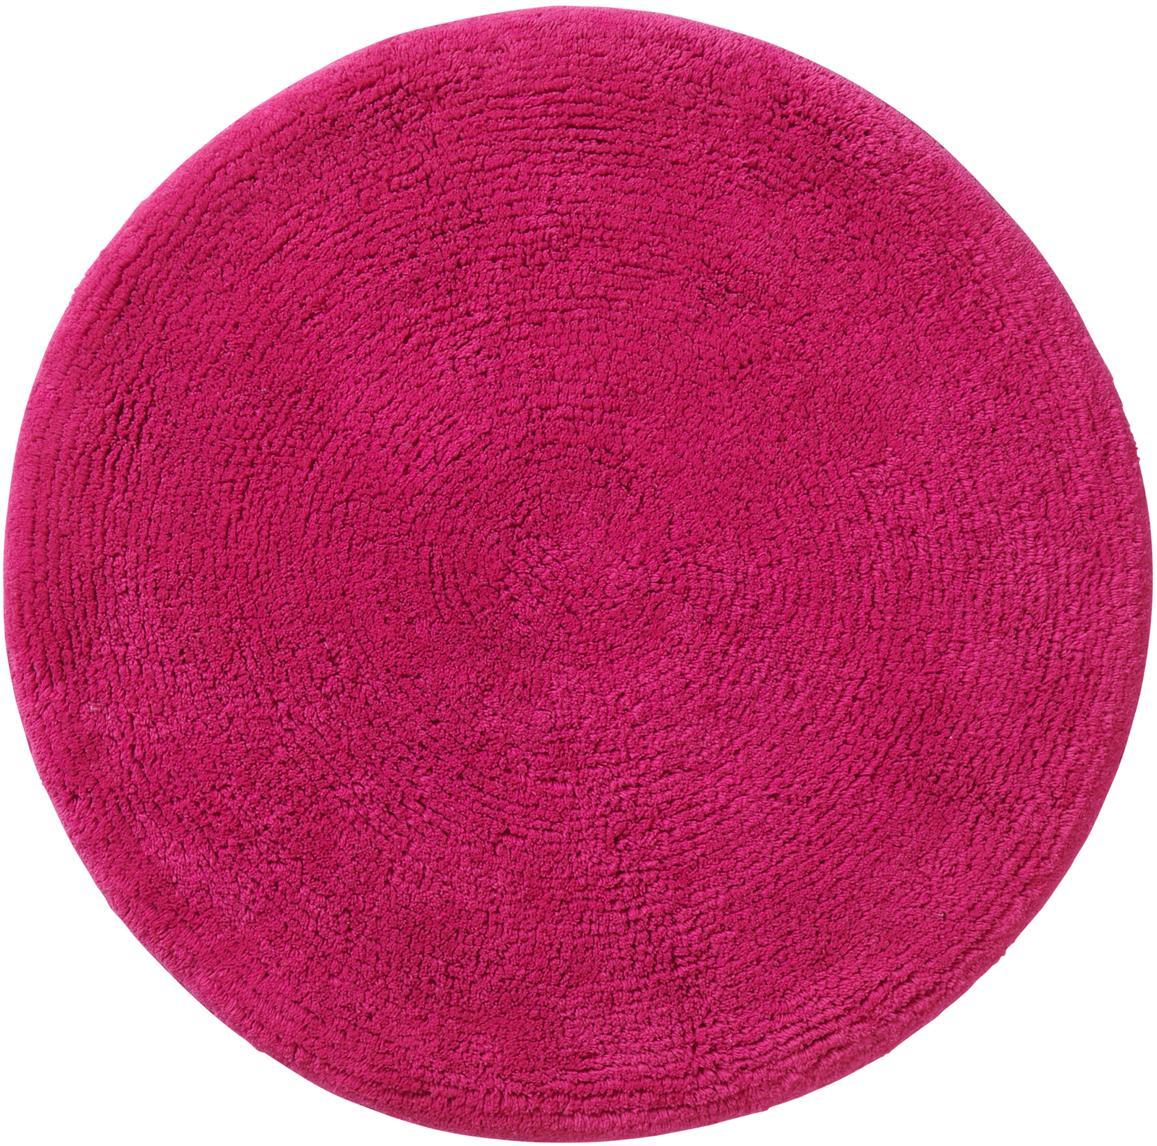 Alfombrilla de baño redonda Emma, 100%algodón, Rosa, Ø 90 cm